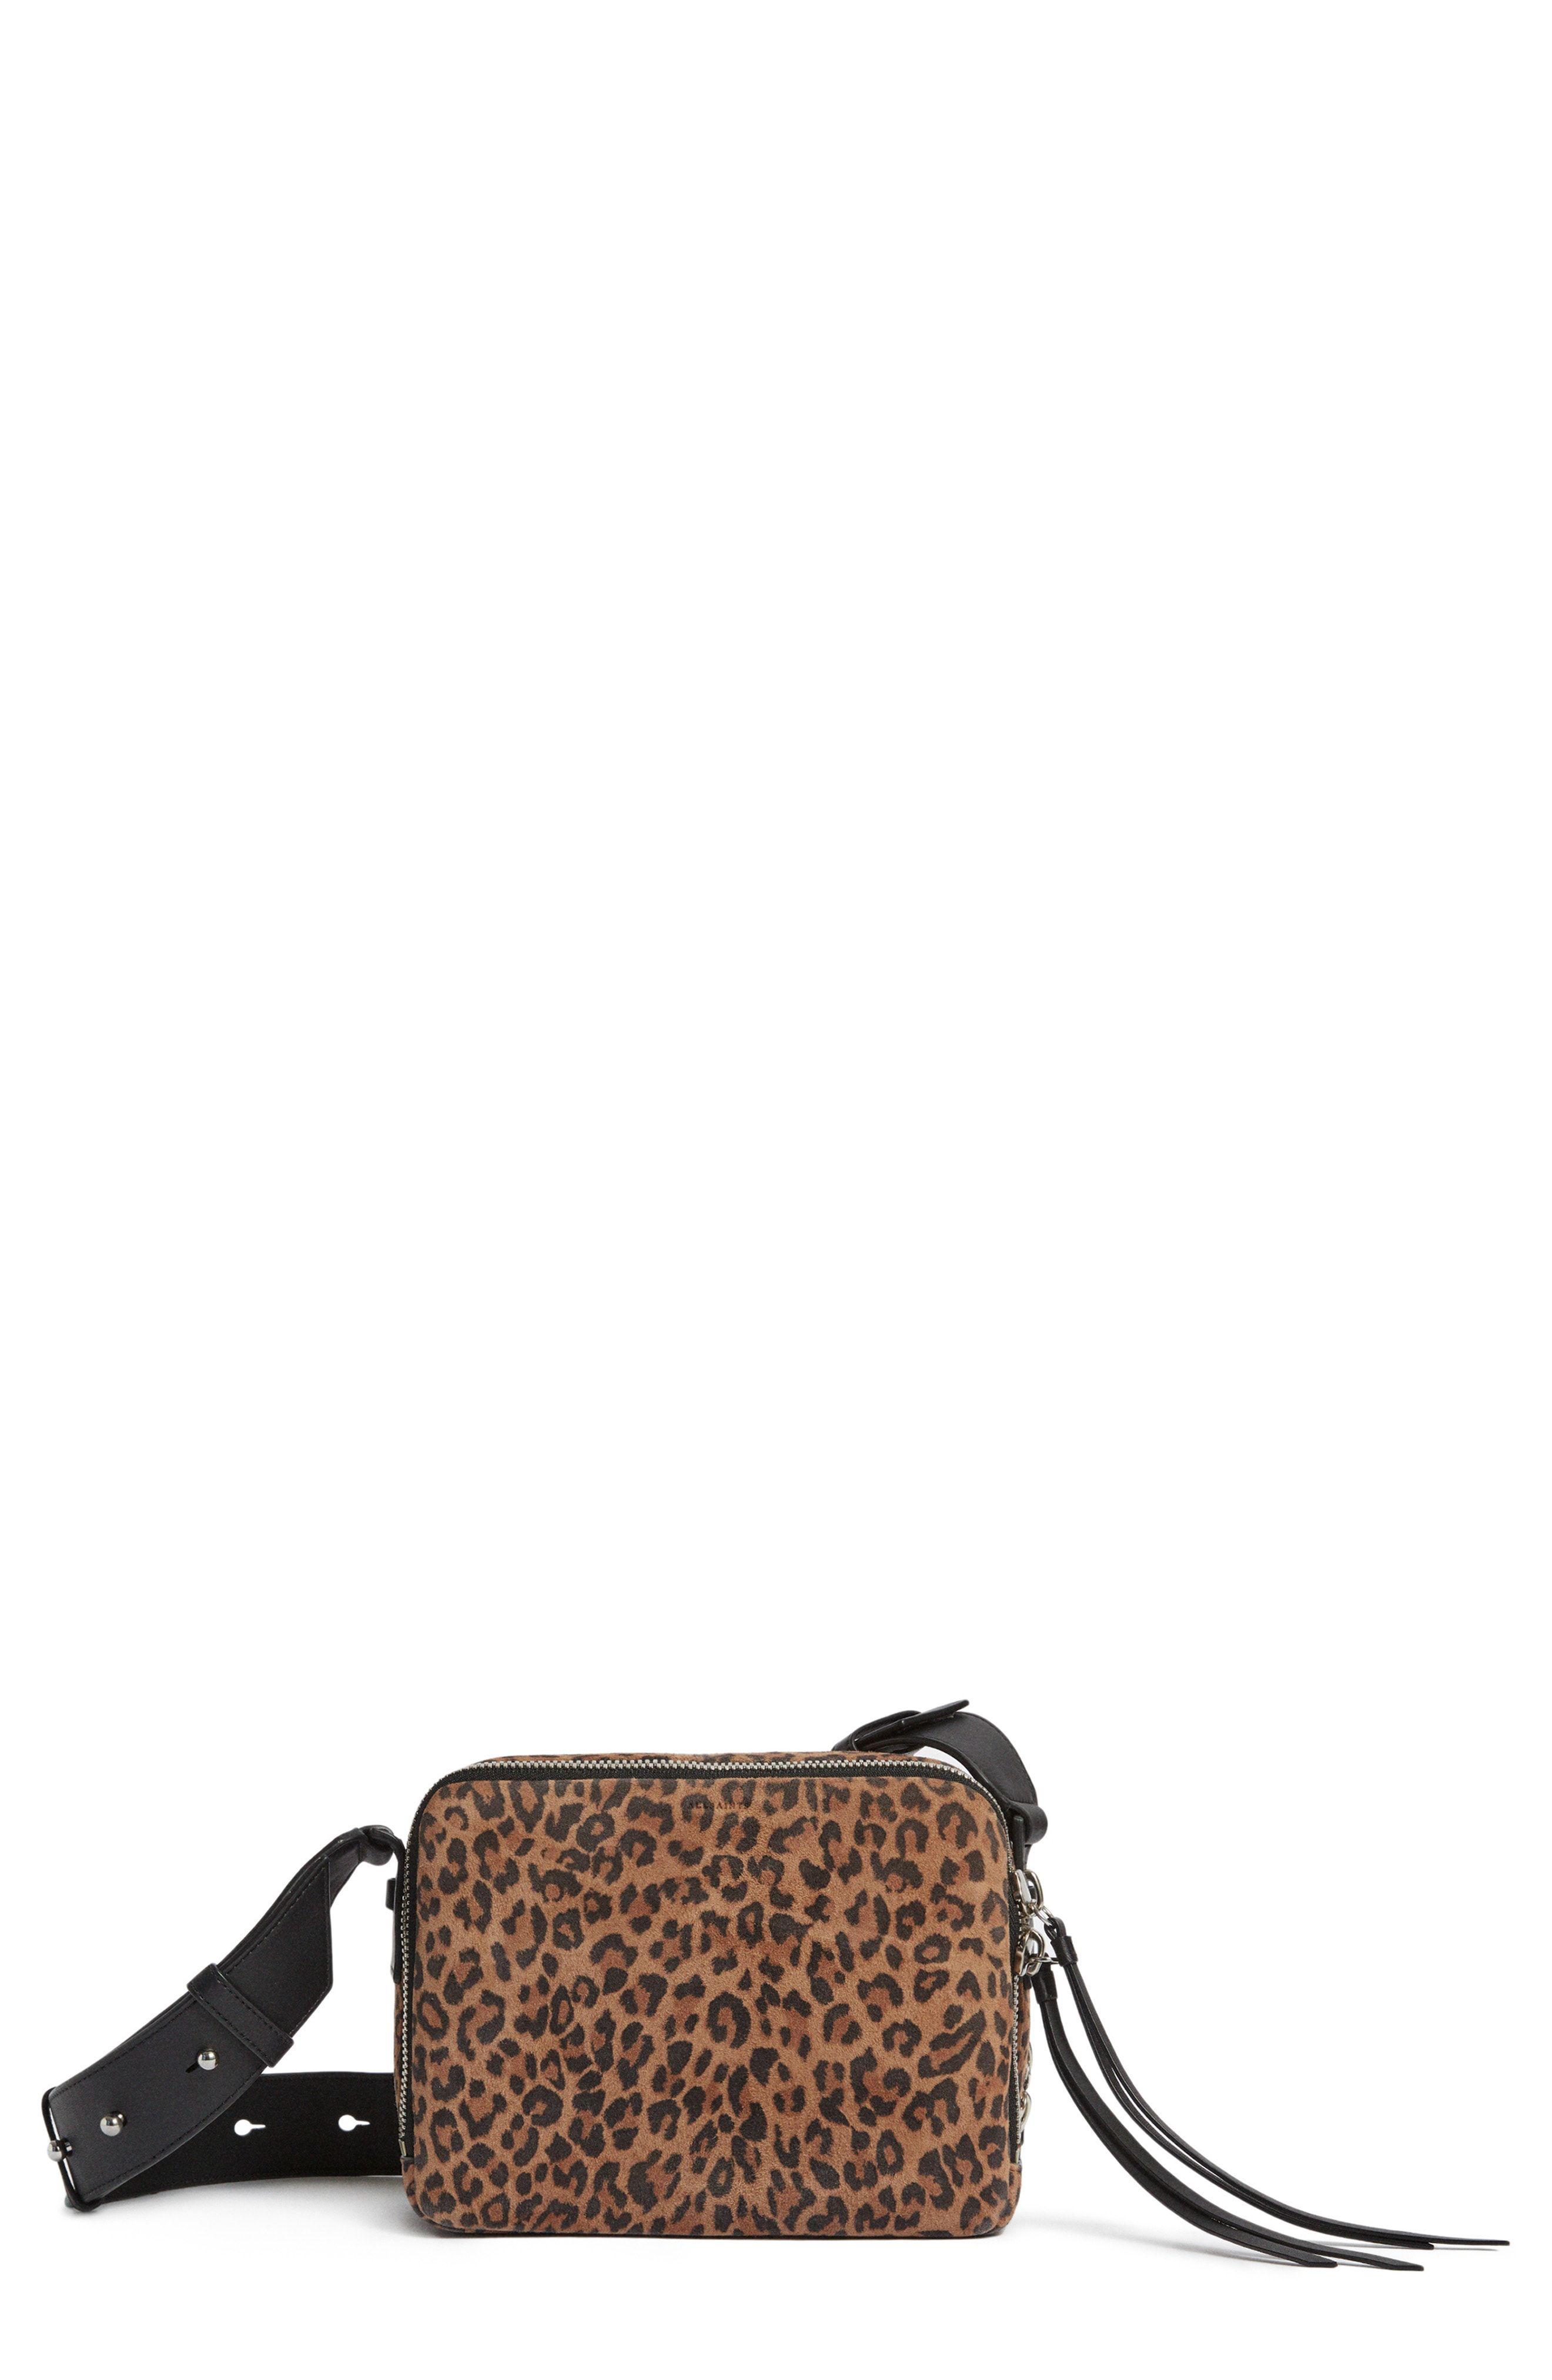 4650582b4 ALLSAINTS Vincent Leather Crossbody Bag available at #Nordstrom All Saints, Leather  Crossbody Bag